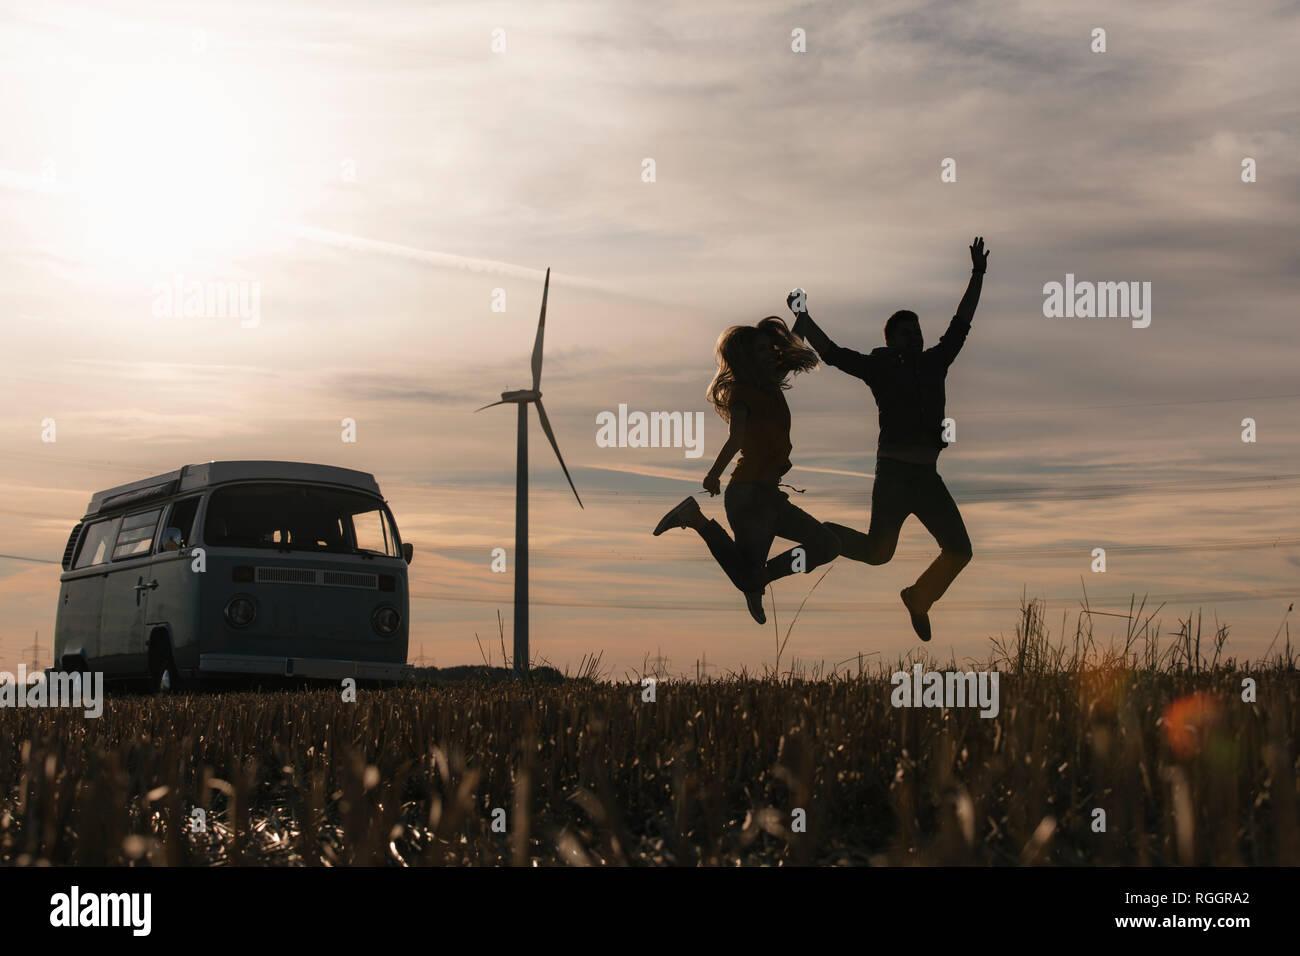 Exuberant couple jumping at camper van in rural landscape at dusk Stock Photo